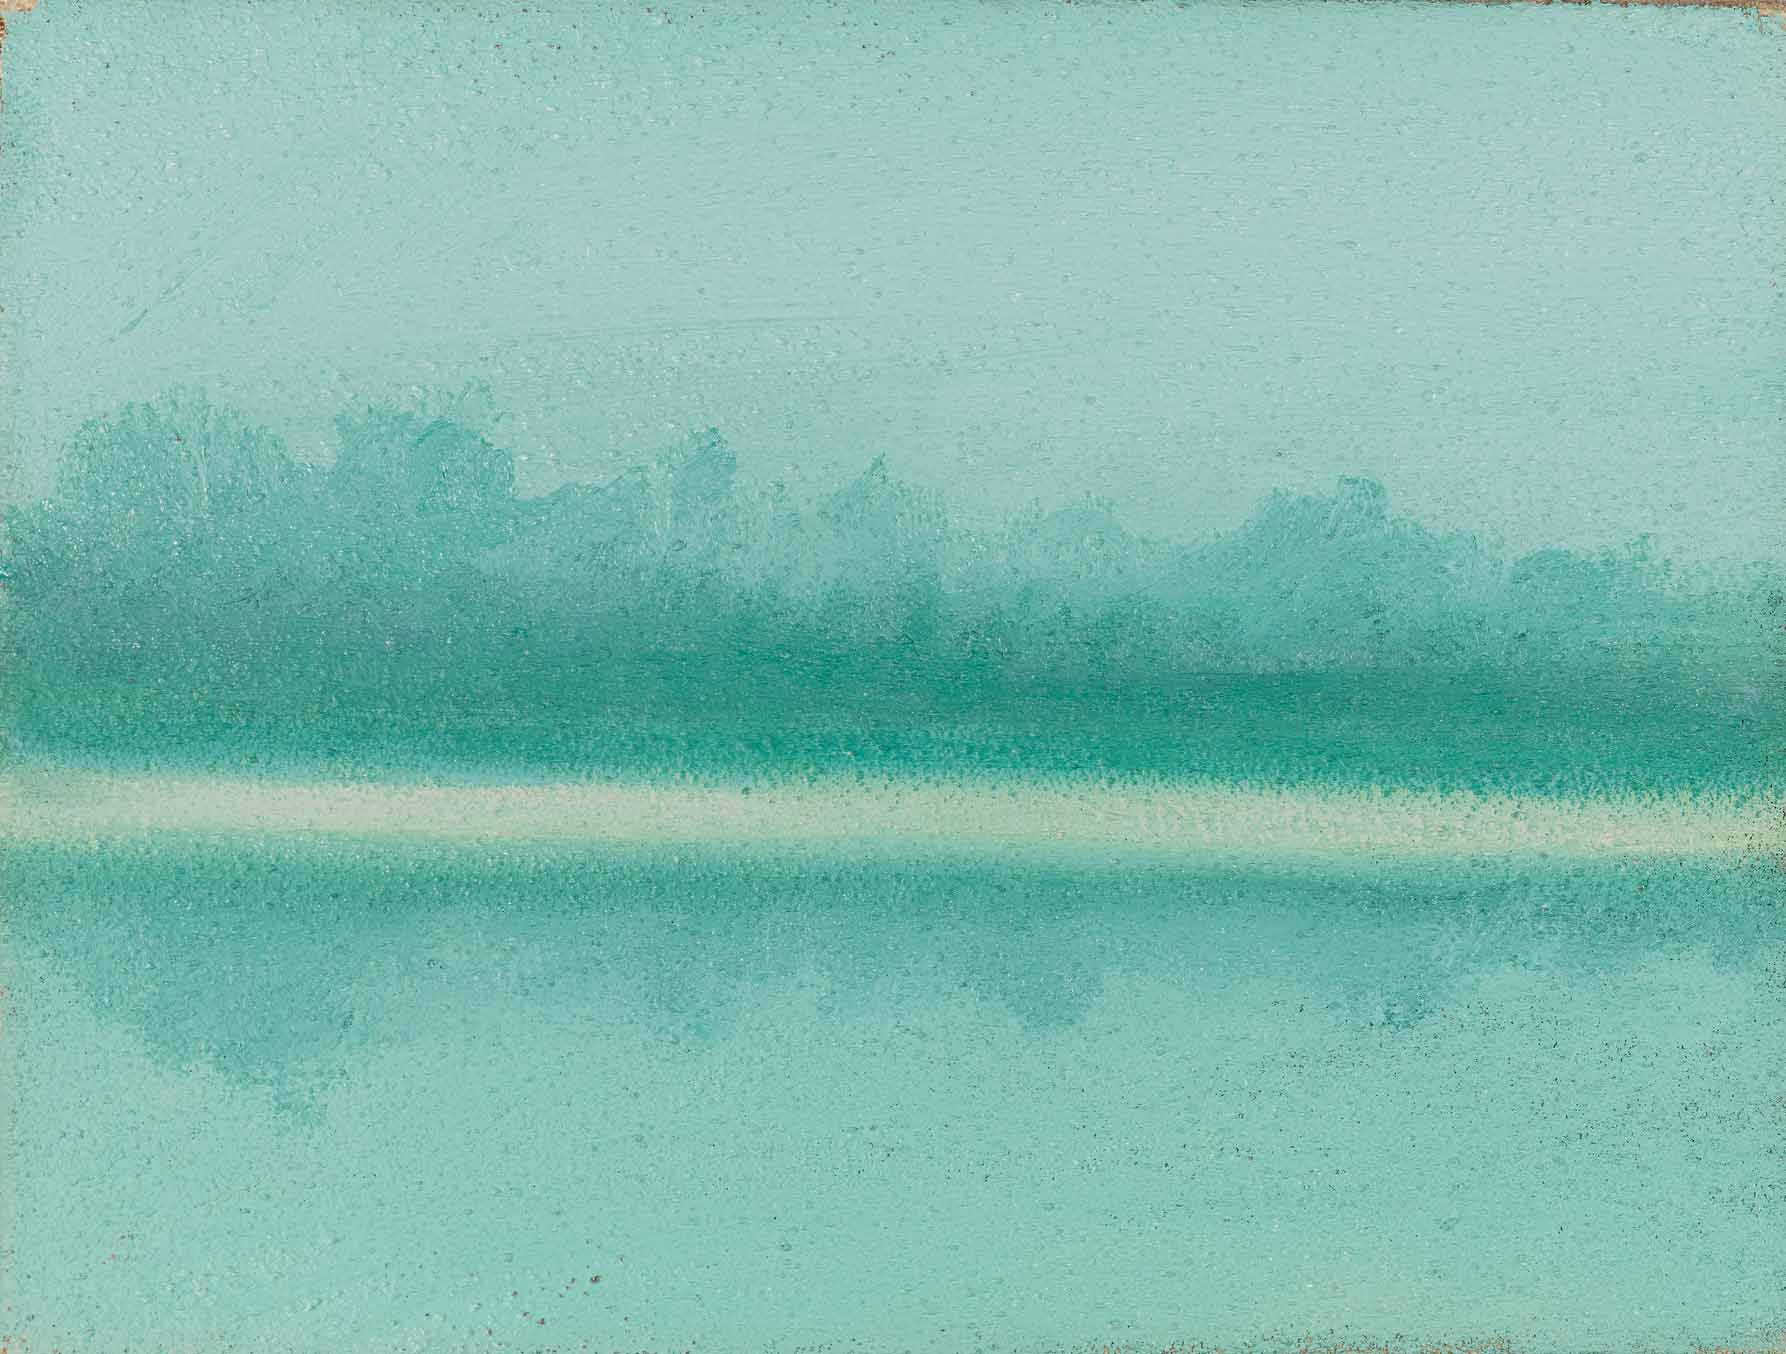 quadro paesaggio, olio su tela, pittore fulvio polesso,milano